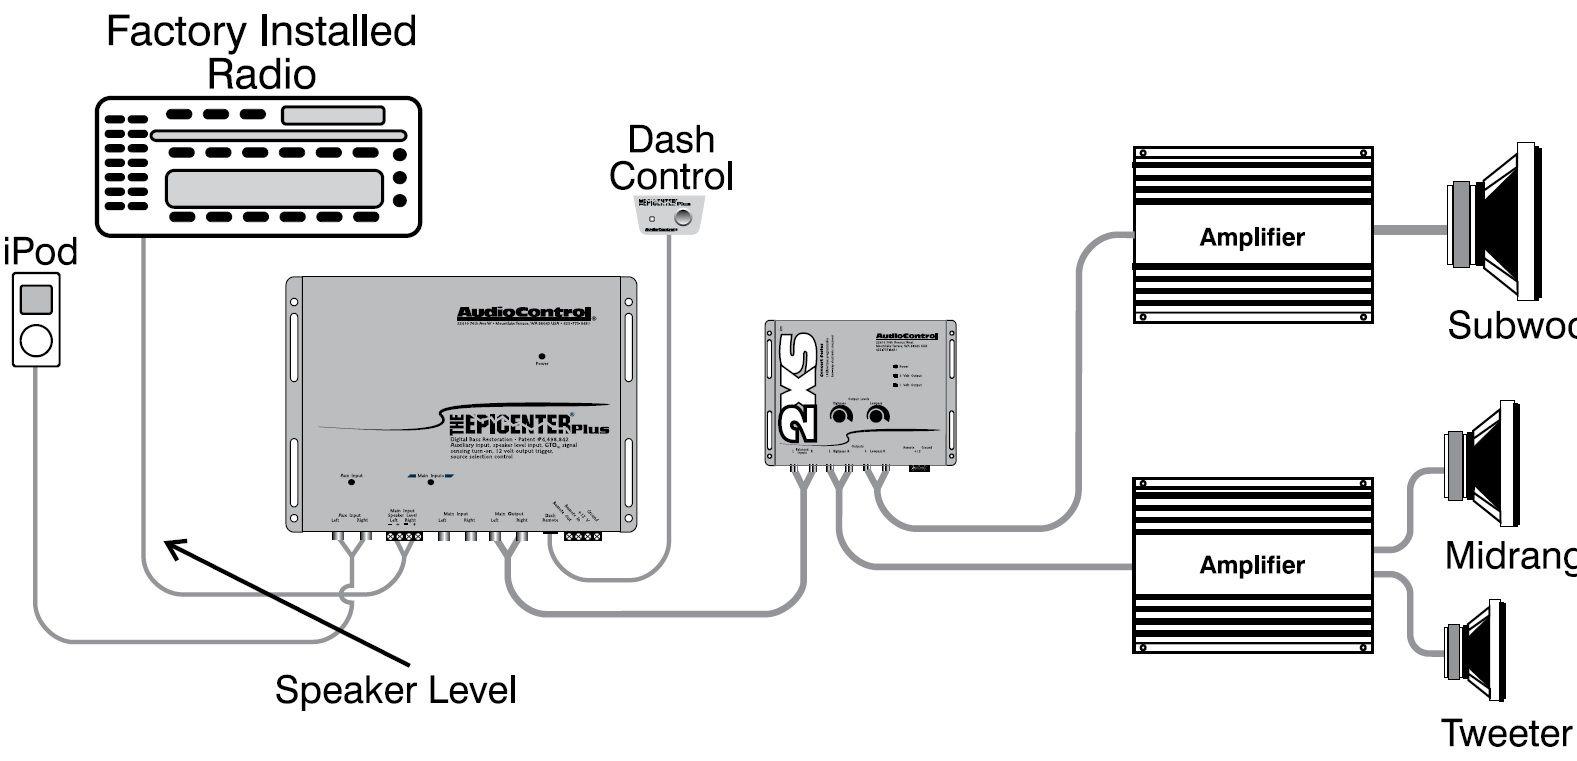 Car Diagrams On Car Images Free Wiring Diagrams Car Audio Systems Car Audio Audio Design